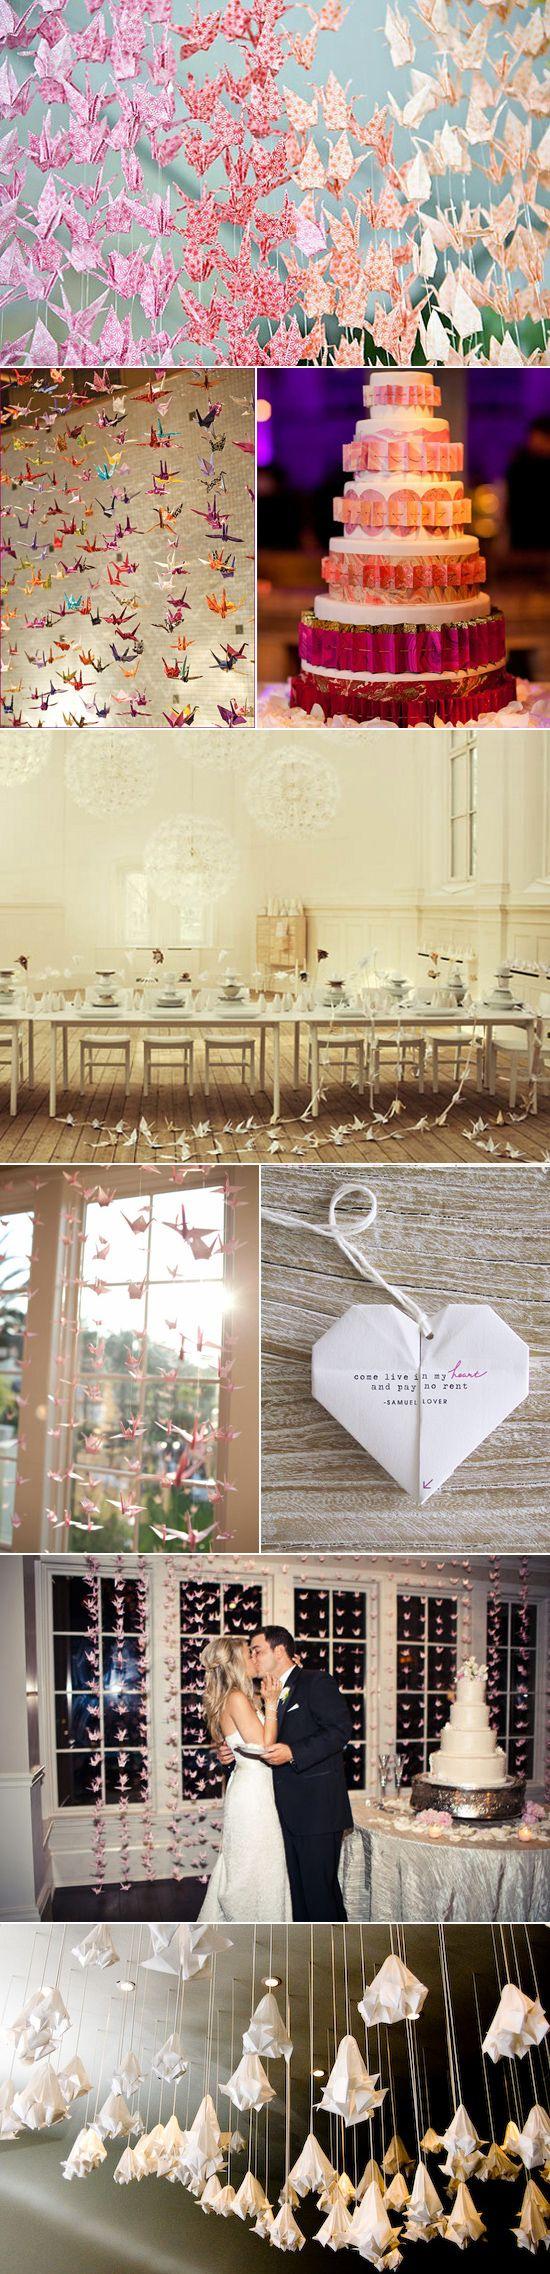 1000+ ideas about Origami Wedding on Pinterest | Origami ... - photo#14